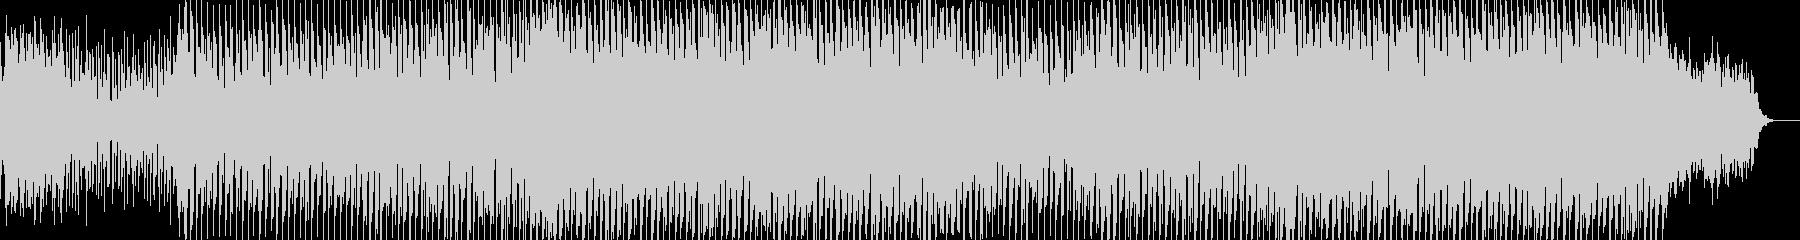 EDMポップで明るいクラブ系-118の未再生の波形